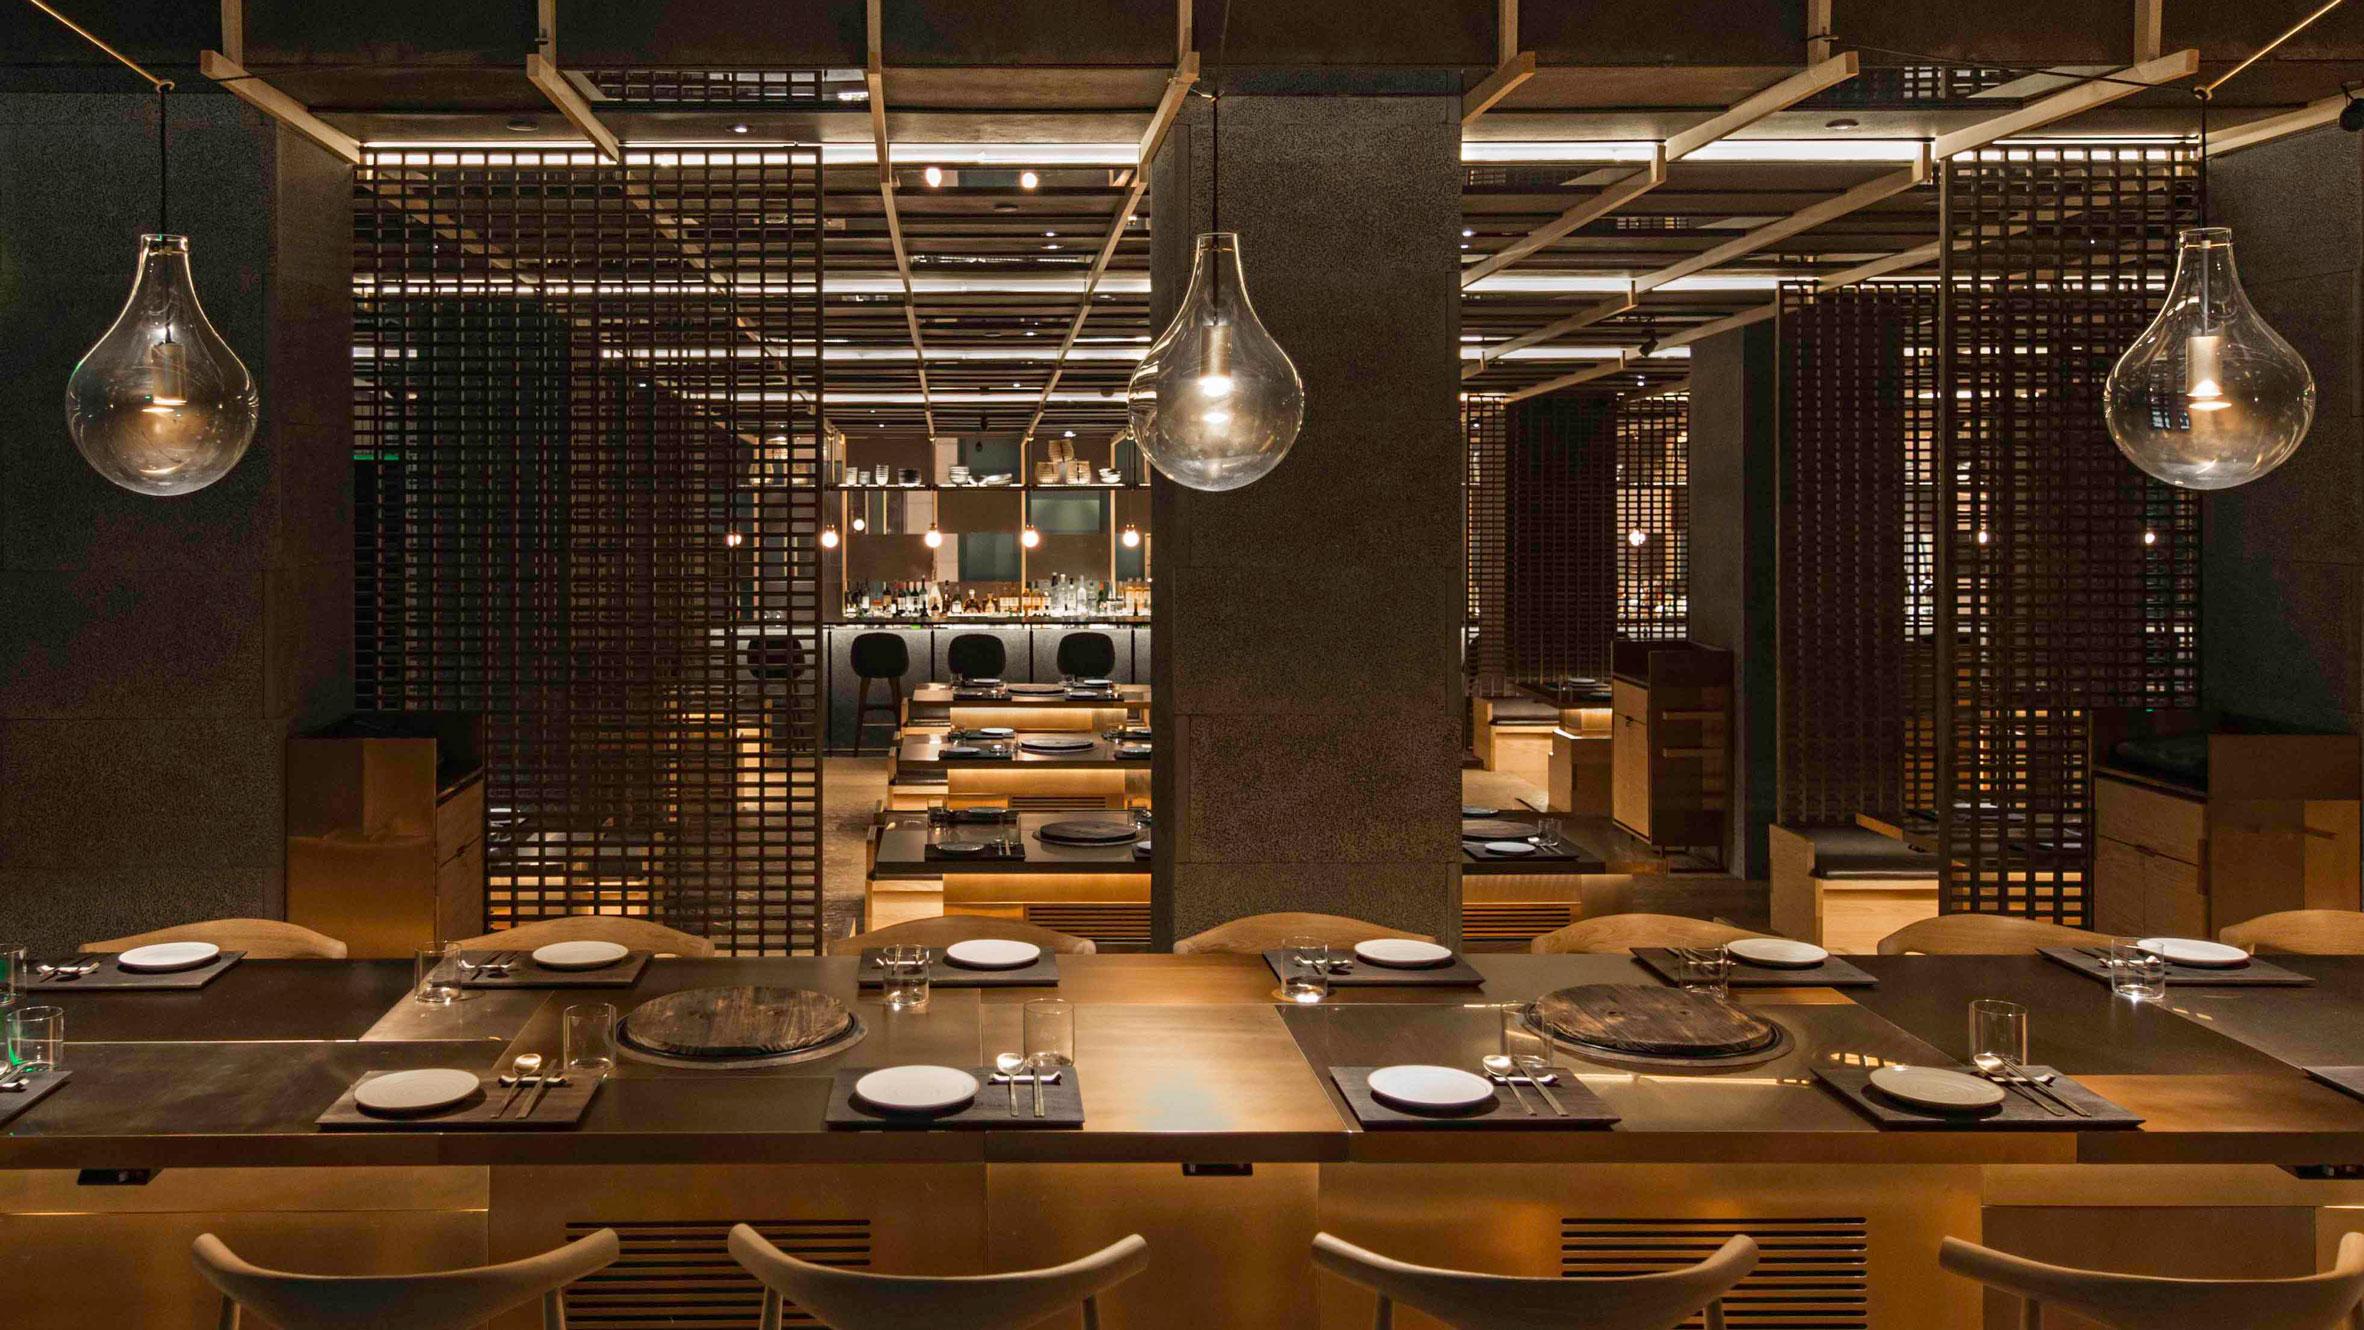 Chi-Q restaurant by Neri&Hu